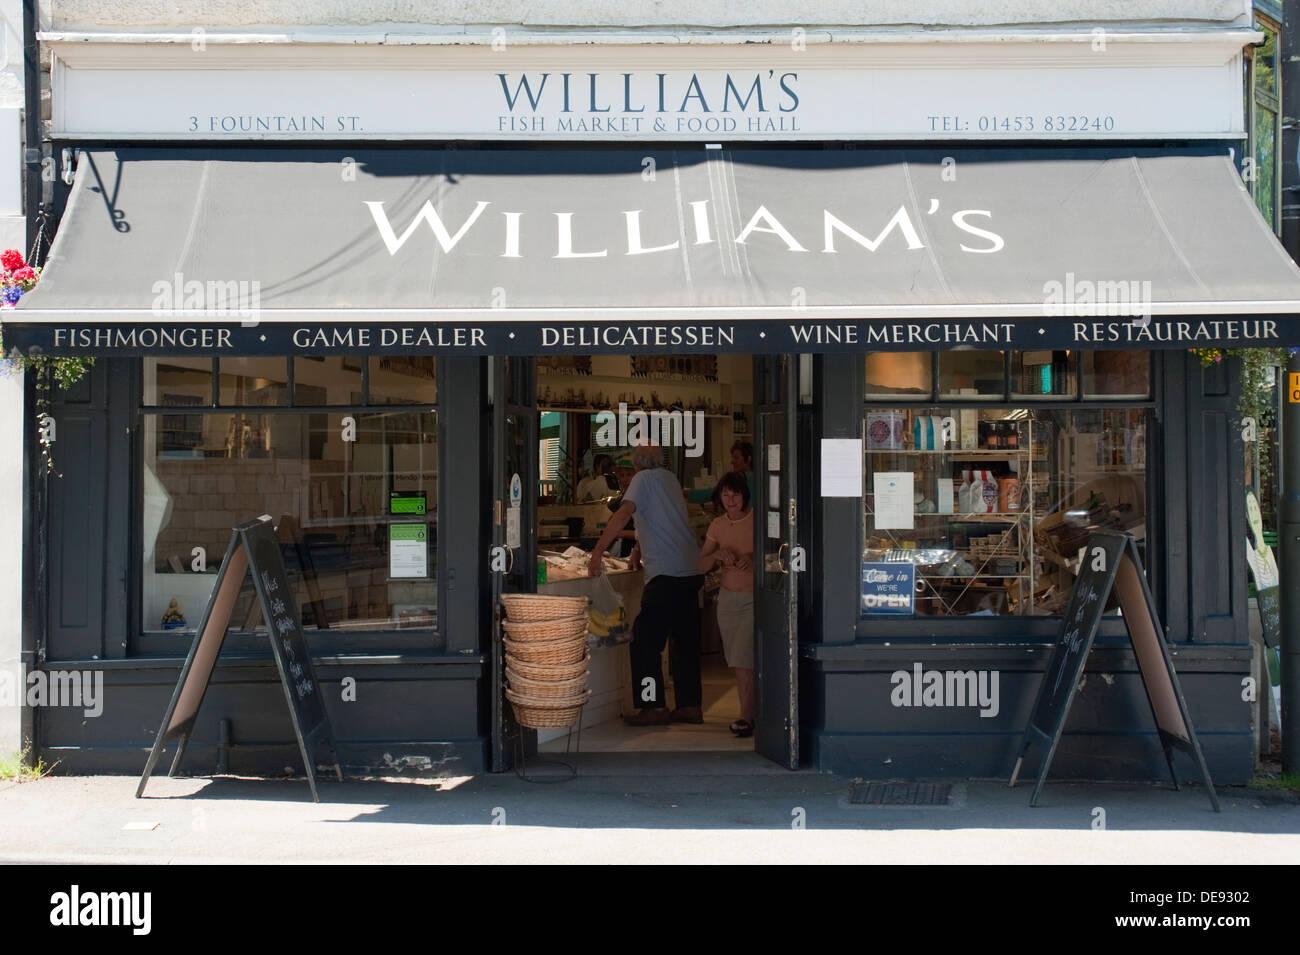 Williams Fish Market And Food Hall Nailsworth